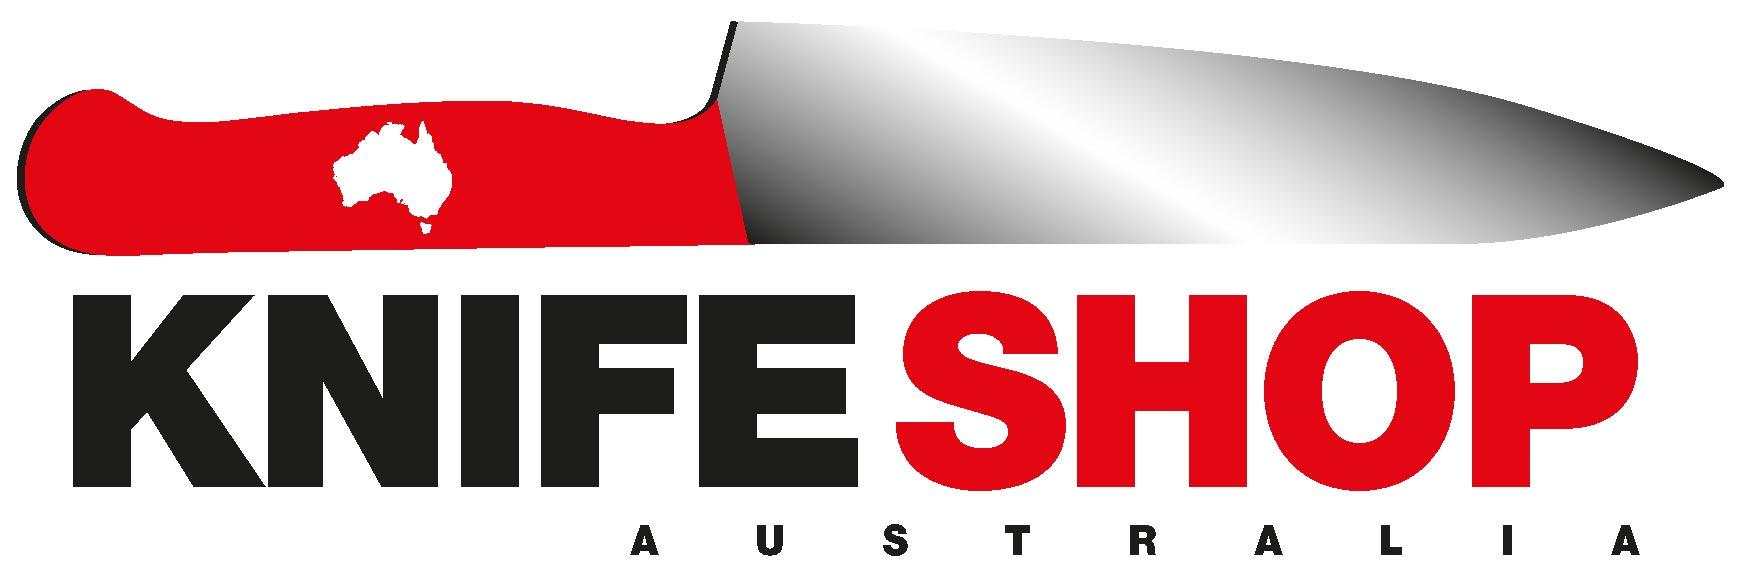 Australia Frosts logo